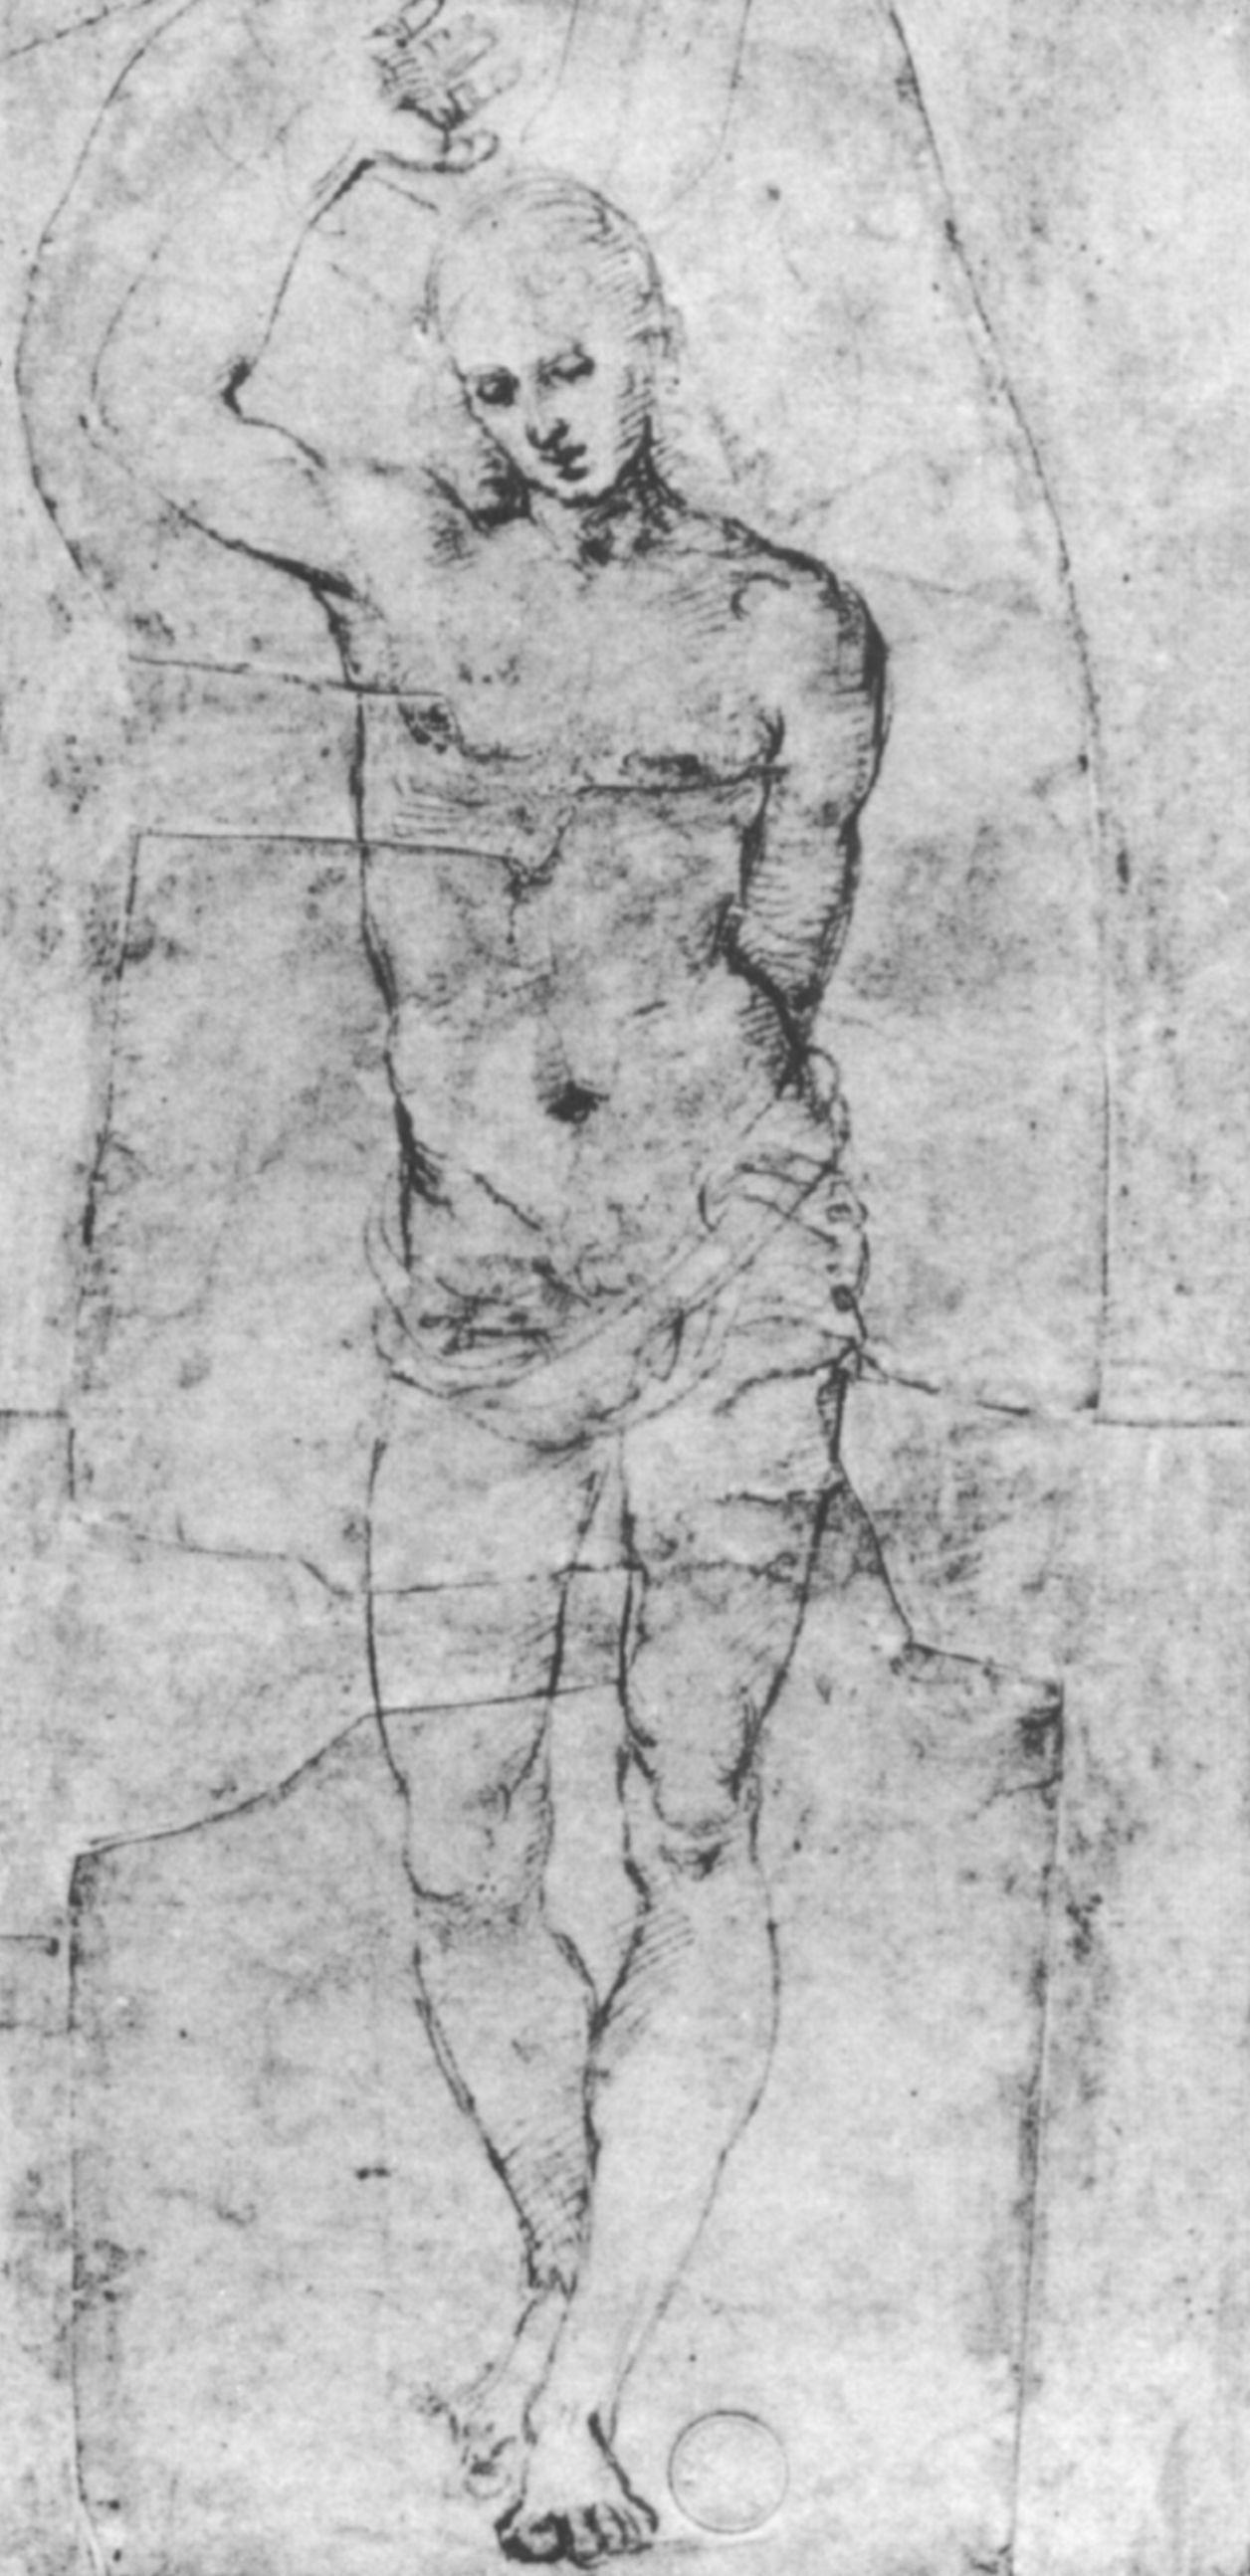 Raphael Sanzio. Sketch of a Nude figure in full growth for SV. Sebastian